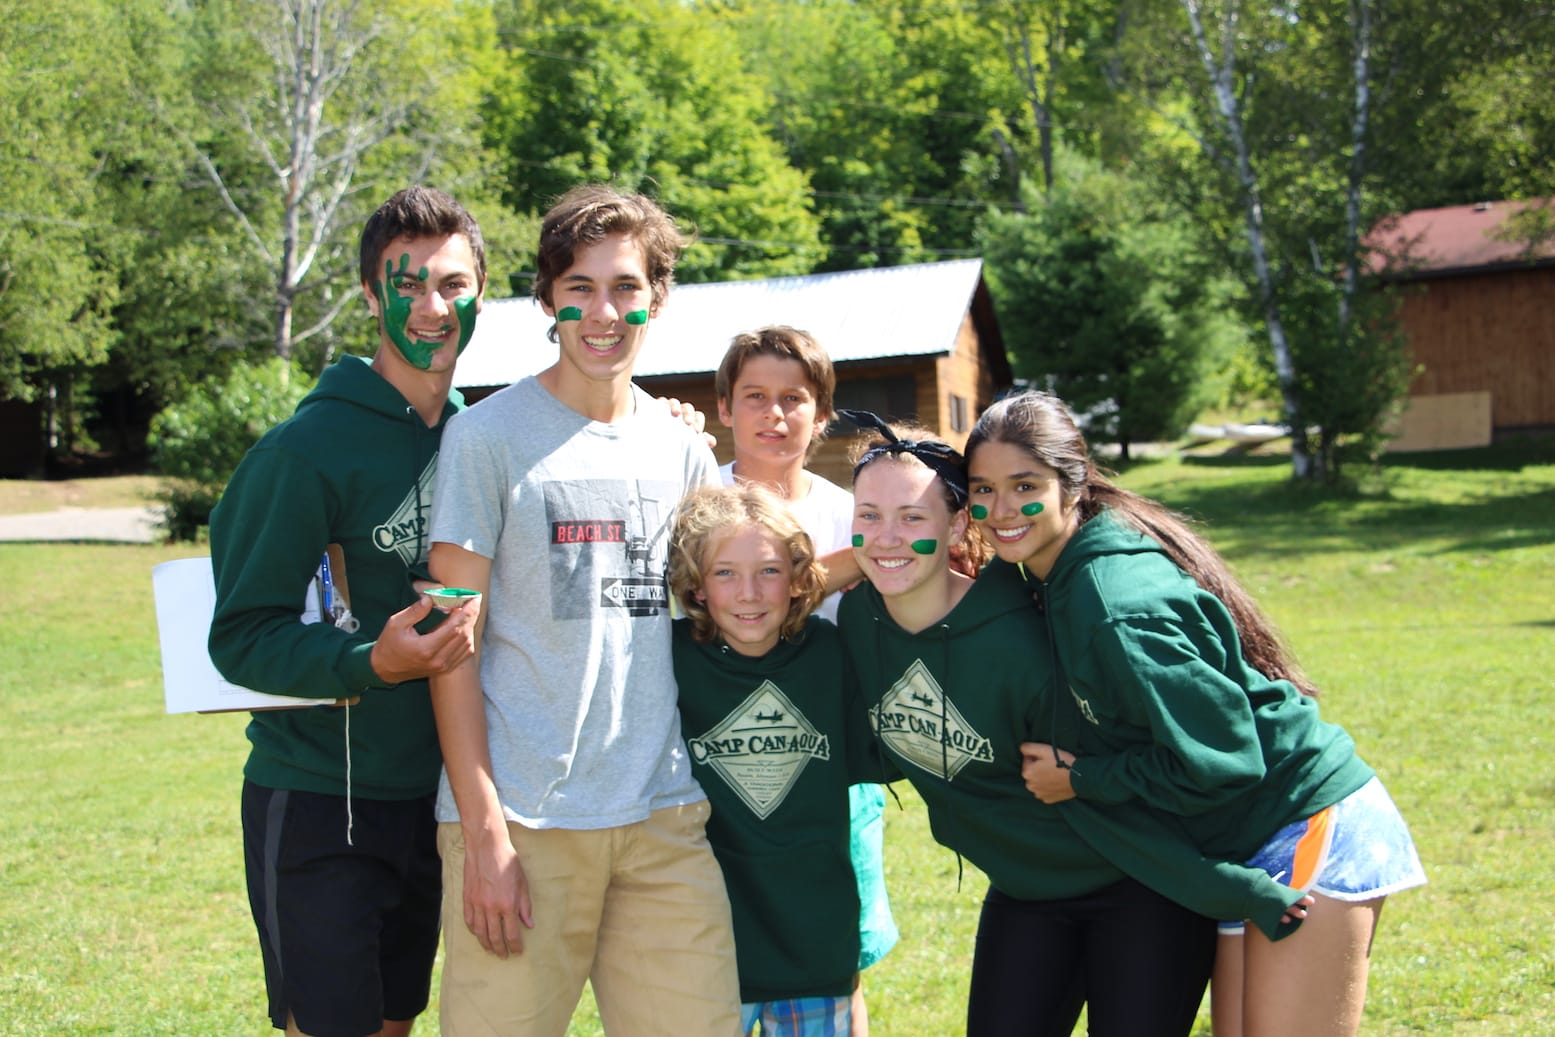 Ontario Summer Camp Can-Aqua Colour Wars